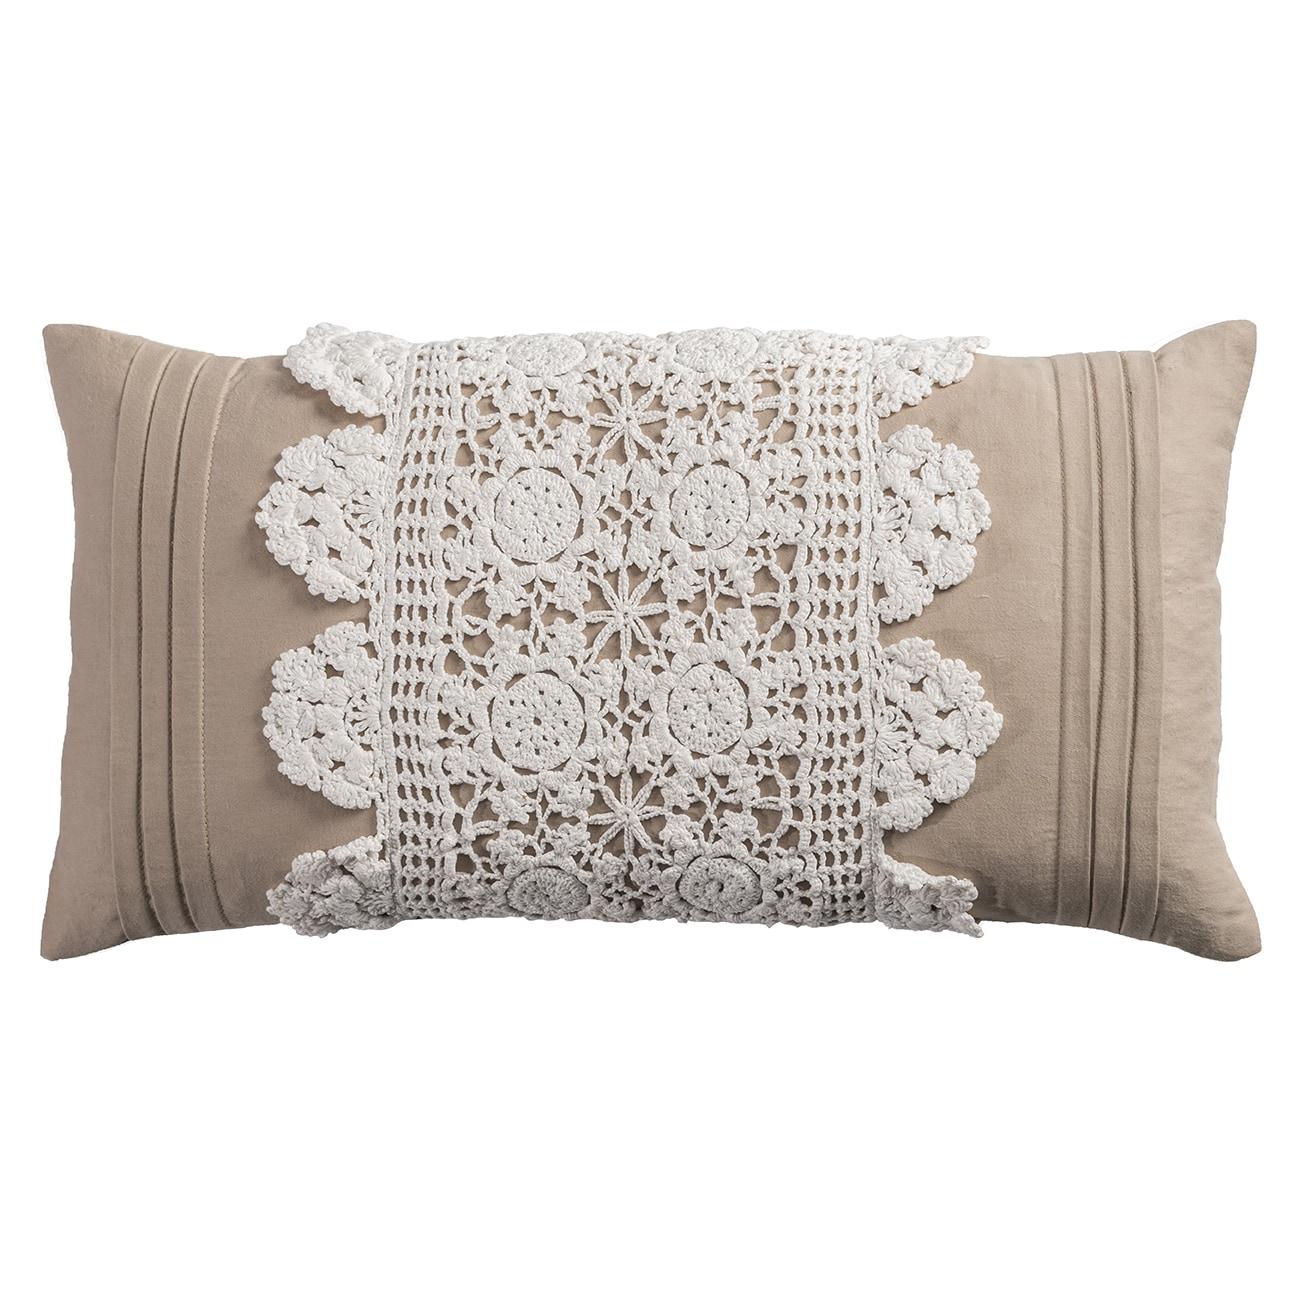 Rizzy Home Cotton 11-inch x 21-inch Crochet Trim Center Decorative Filled Throw Pillow (11 x 21 IVORY crochet trim center)